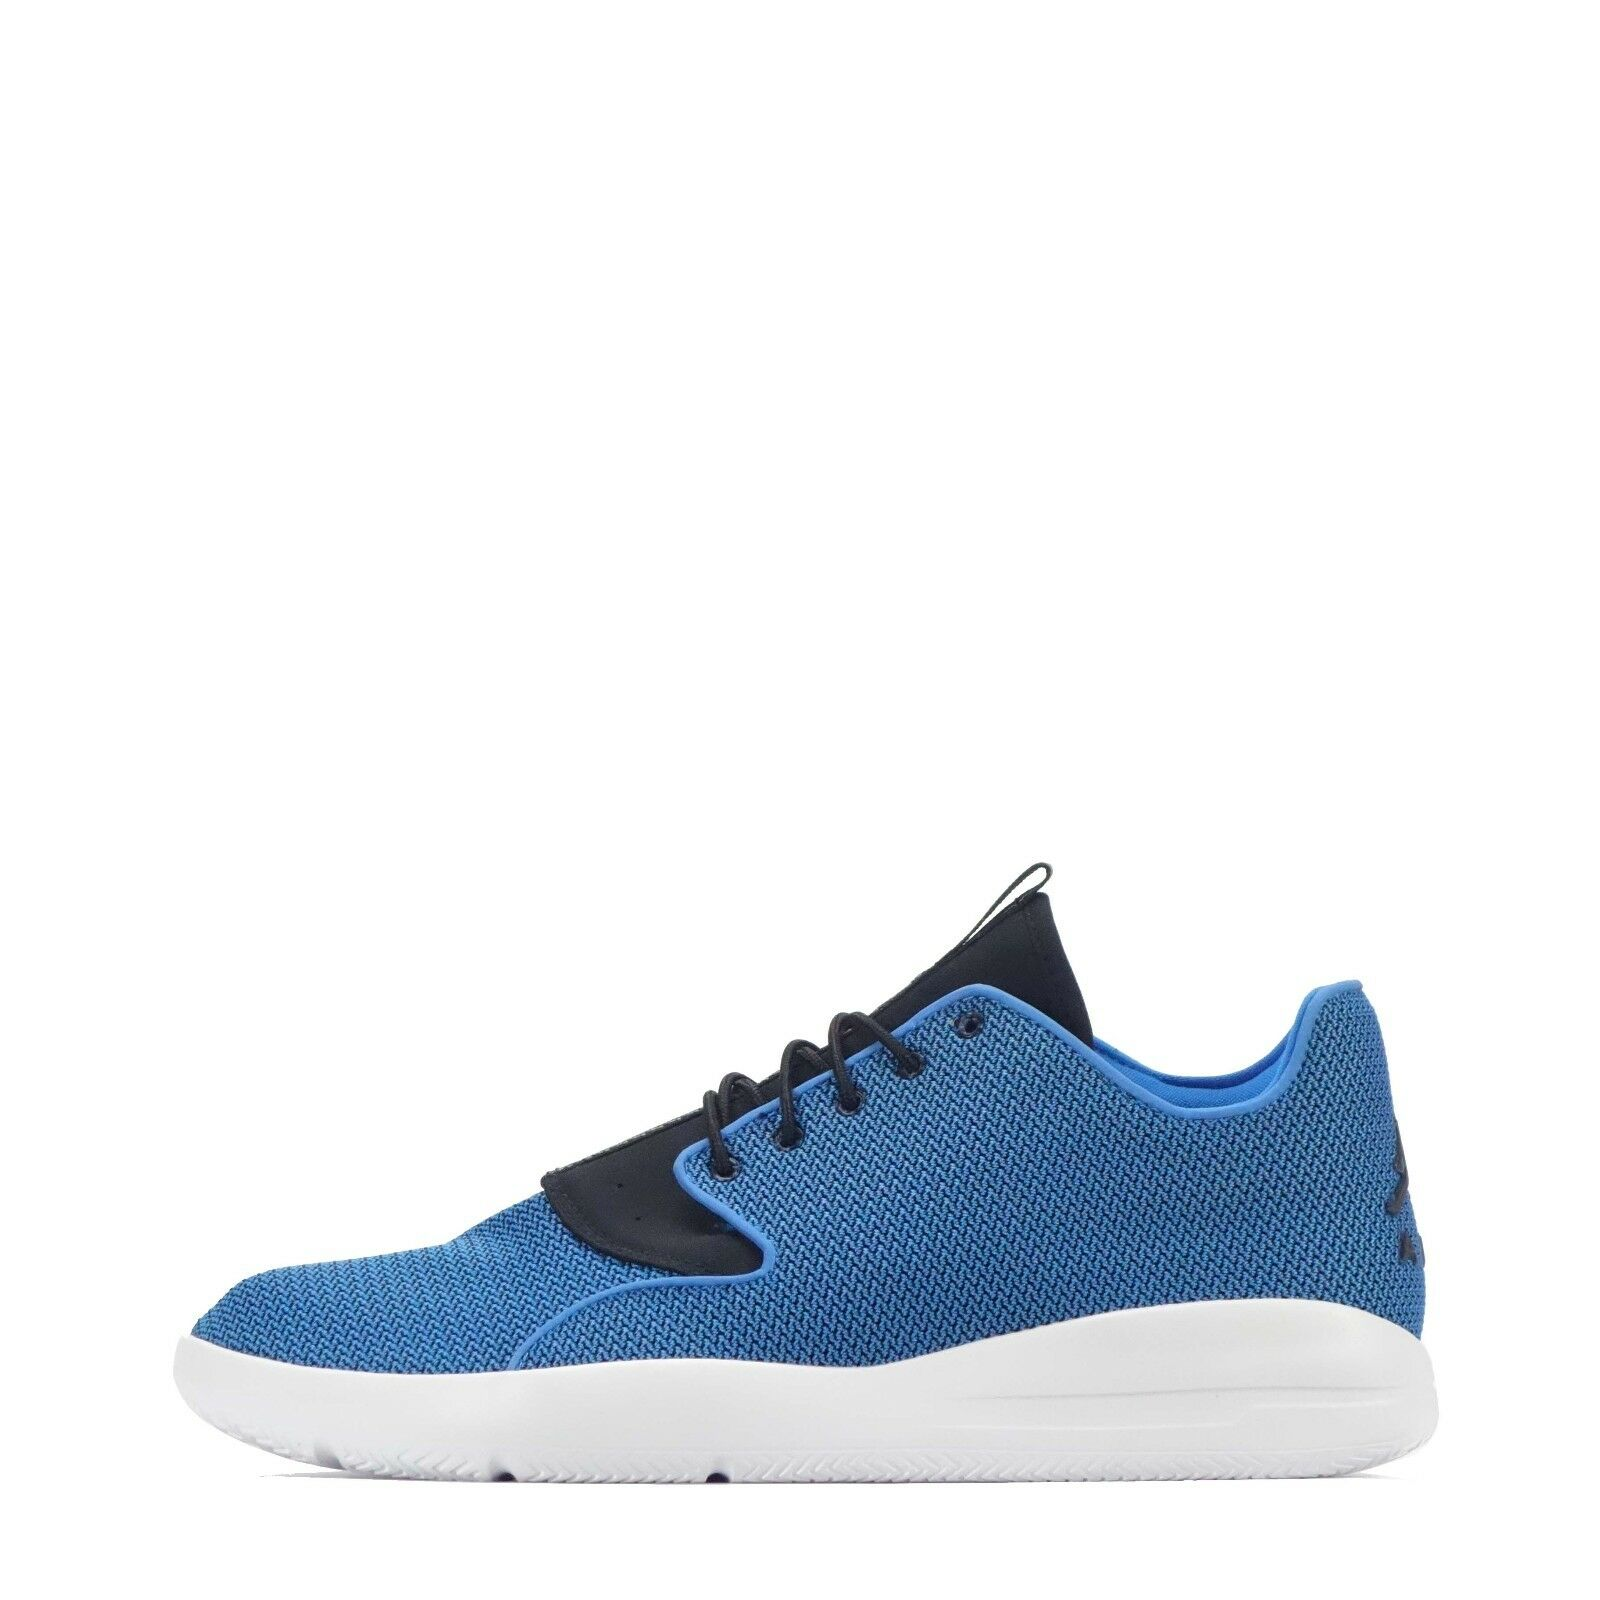 Nike jordan eclissi uomini formatori scarpe foto blu / nero